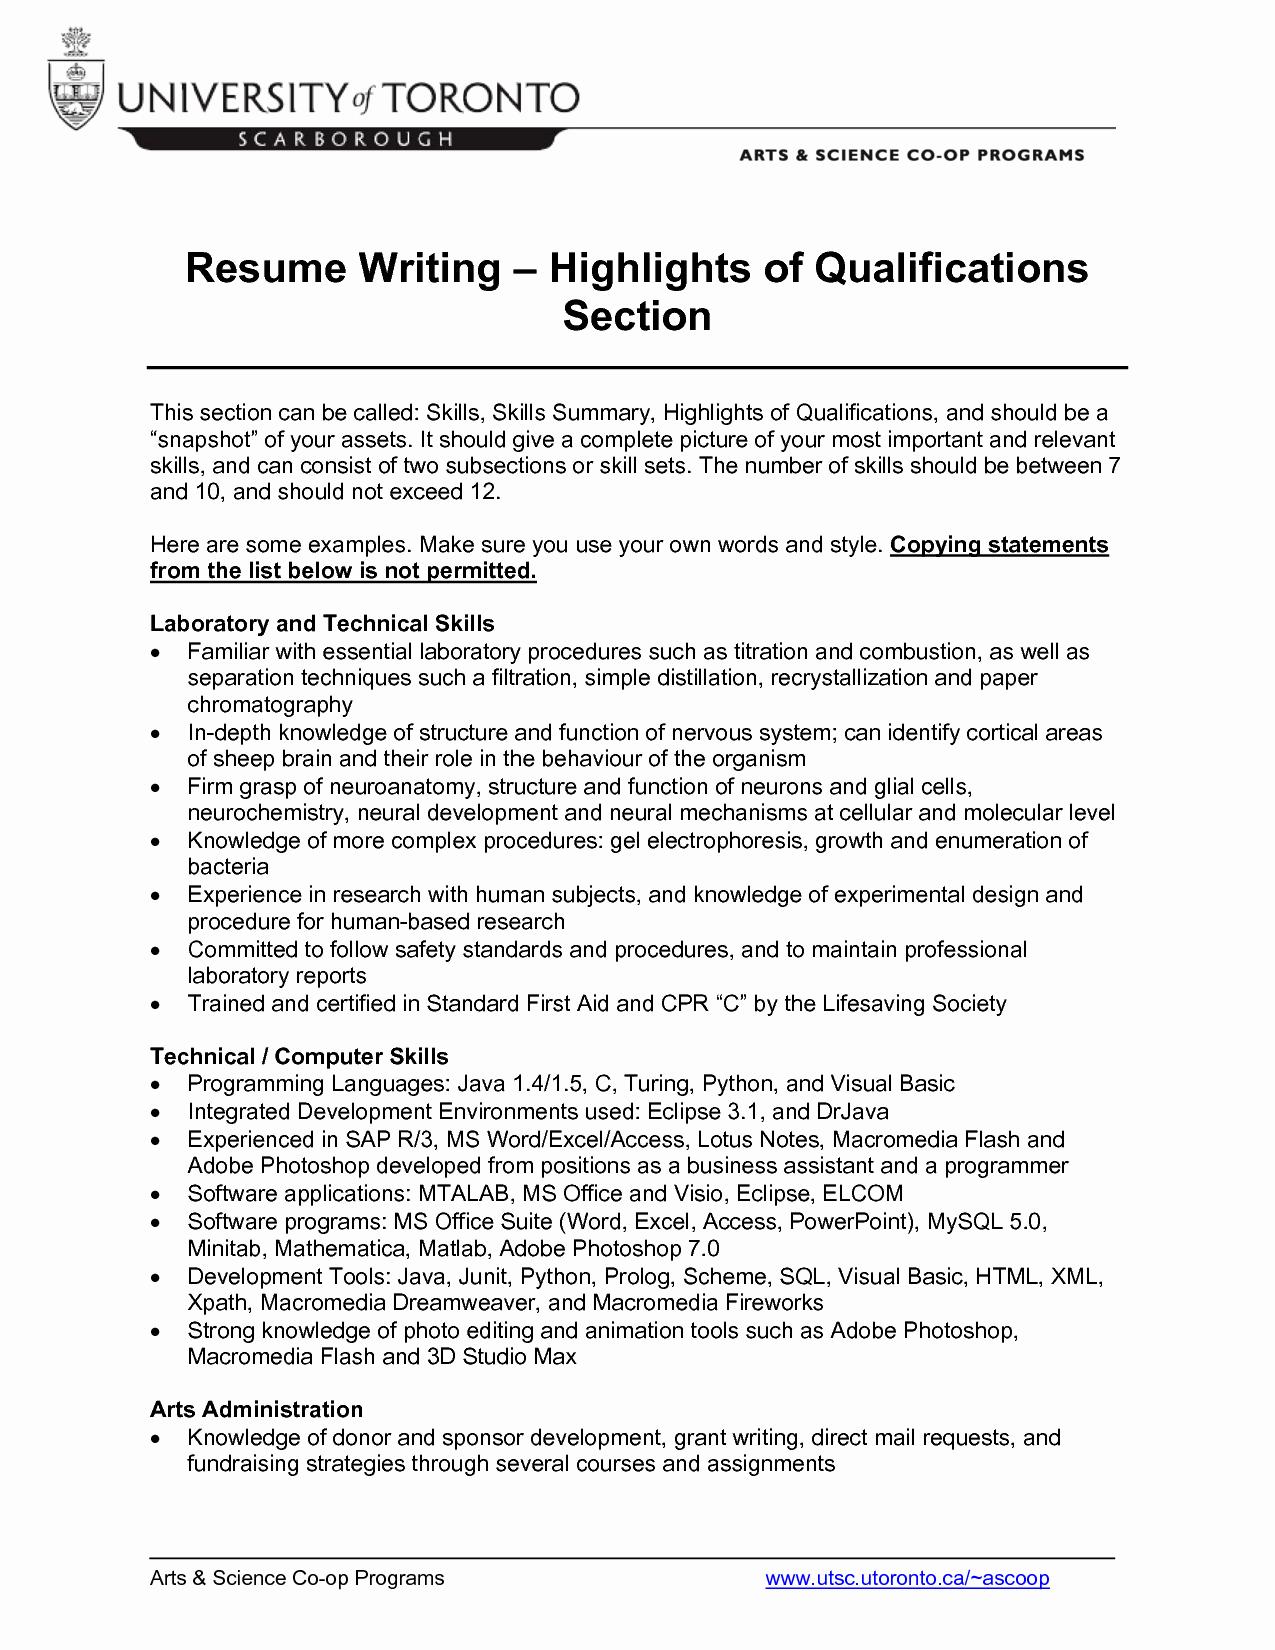 Puter Skills Qualifications Resume